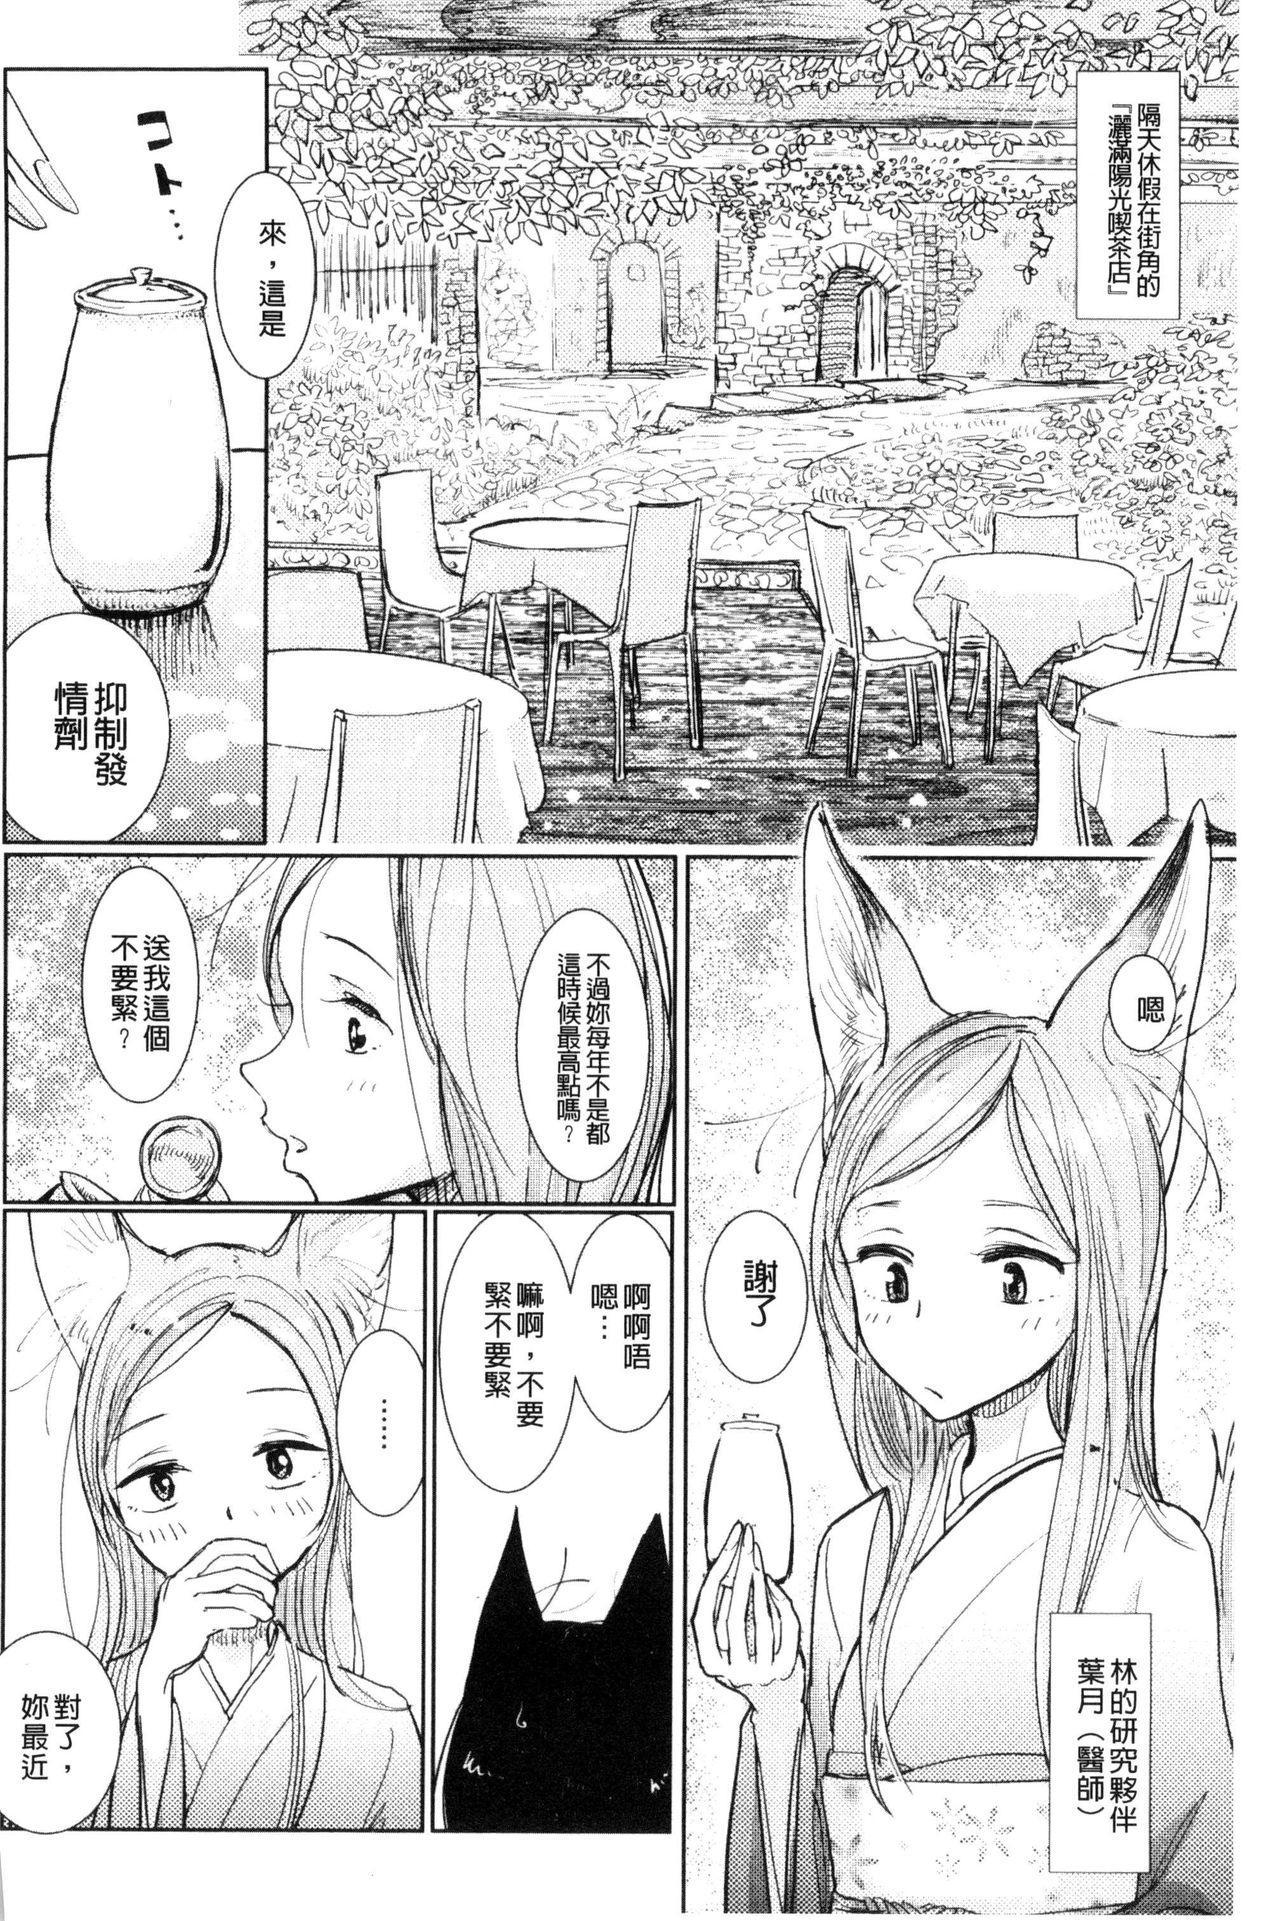 [Dhibi] Sono Yubisaki de Korogashite - Please Caress it at the Finger-tip. [Chinese] 61